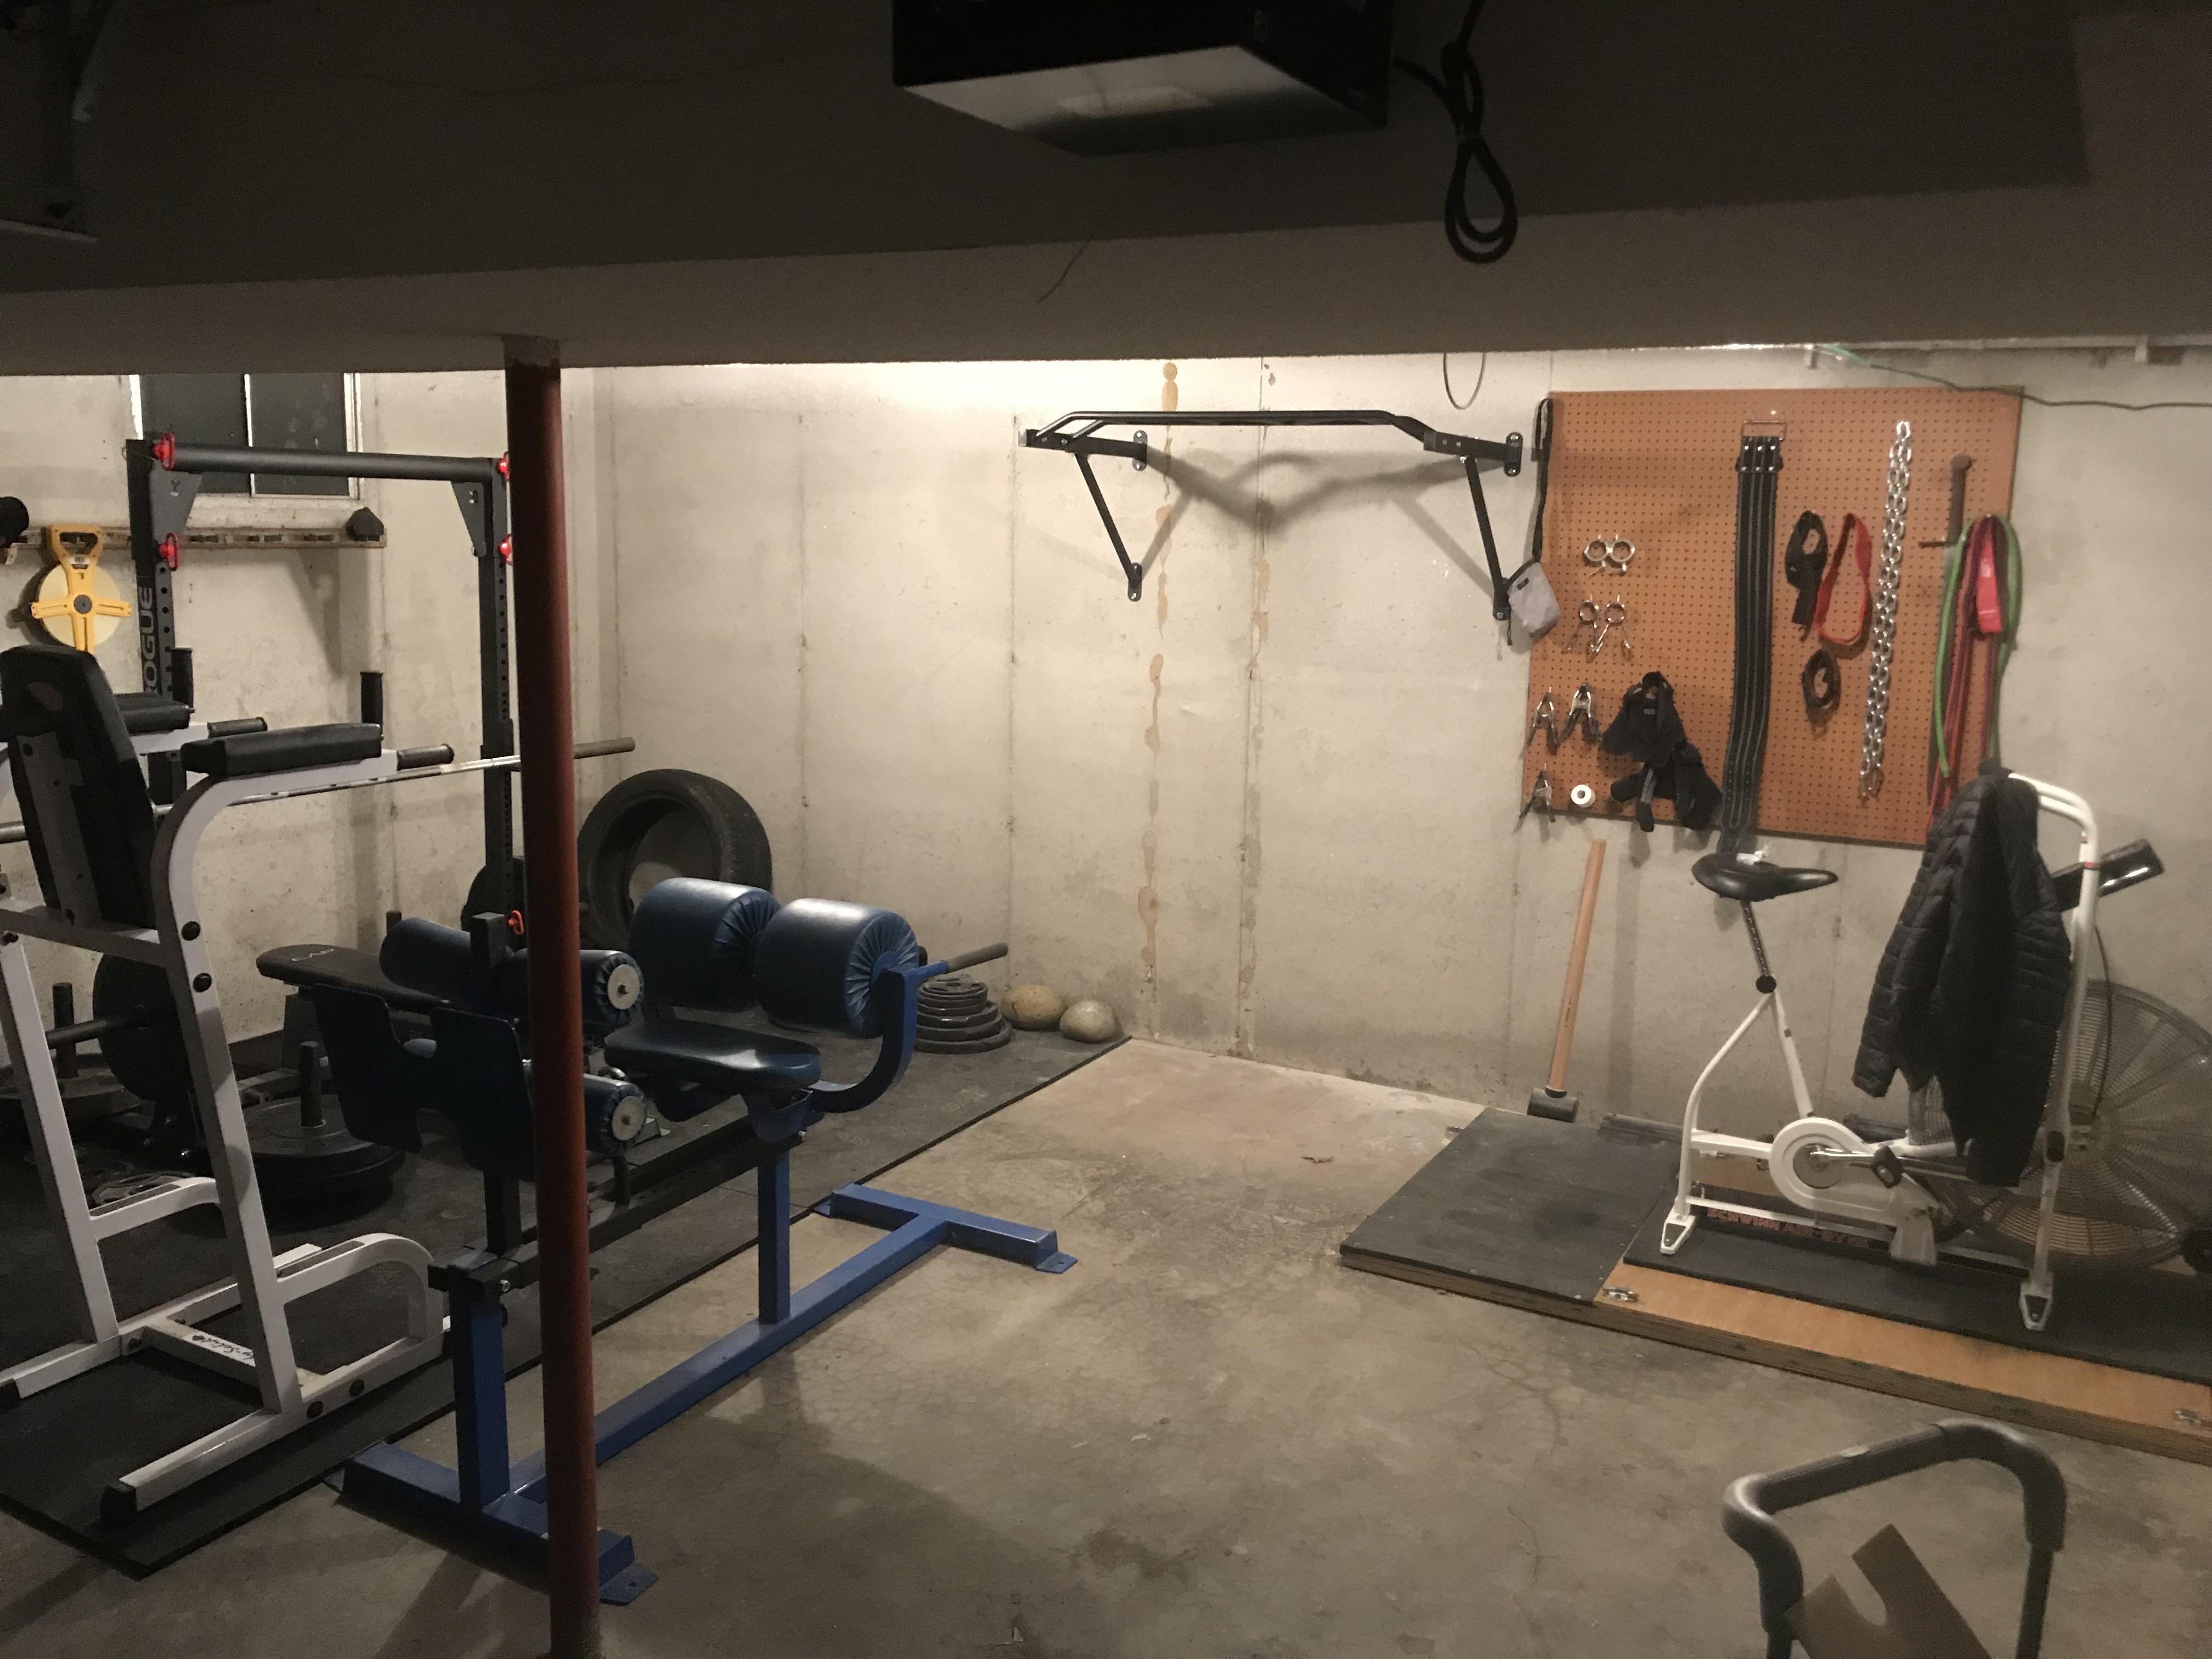 Rogue garage gym youtube